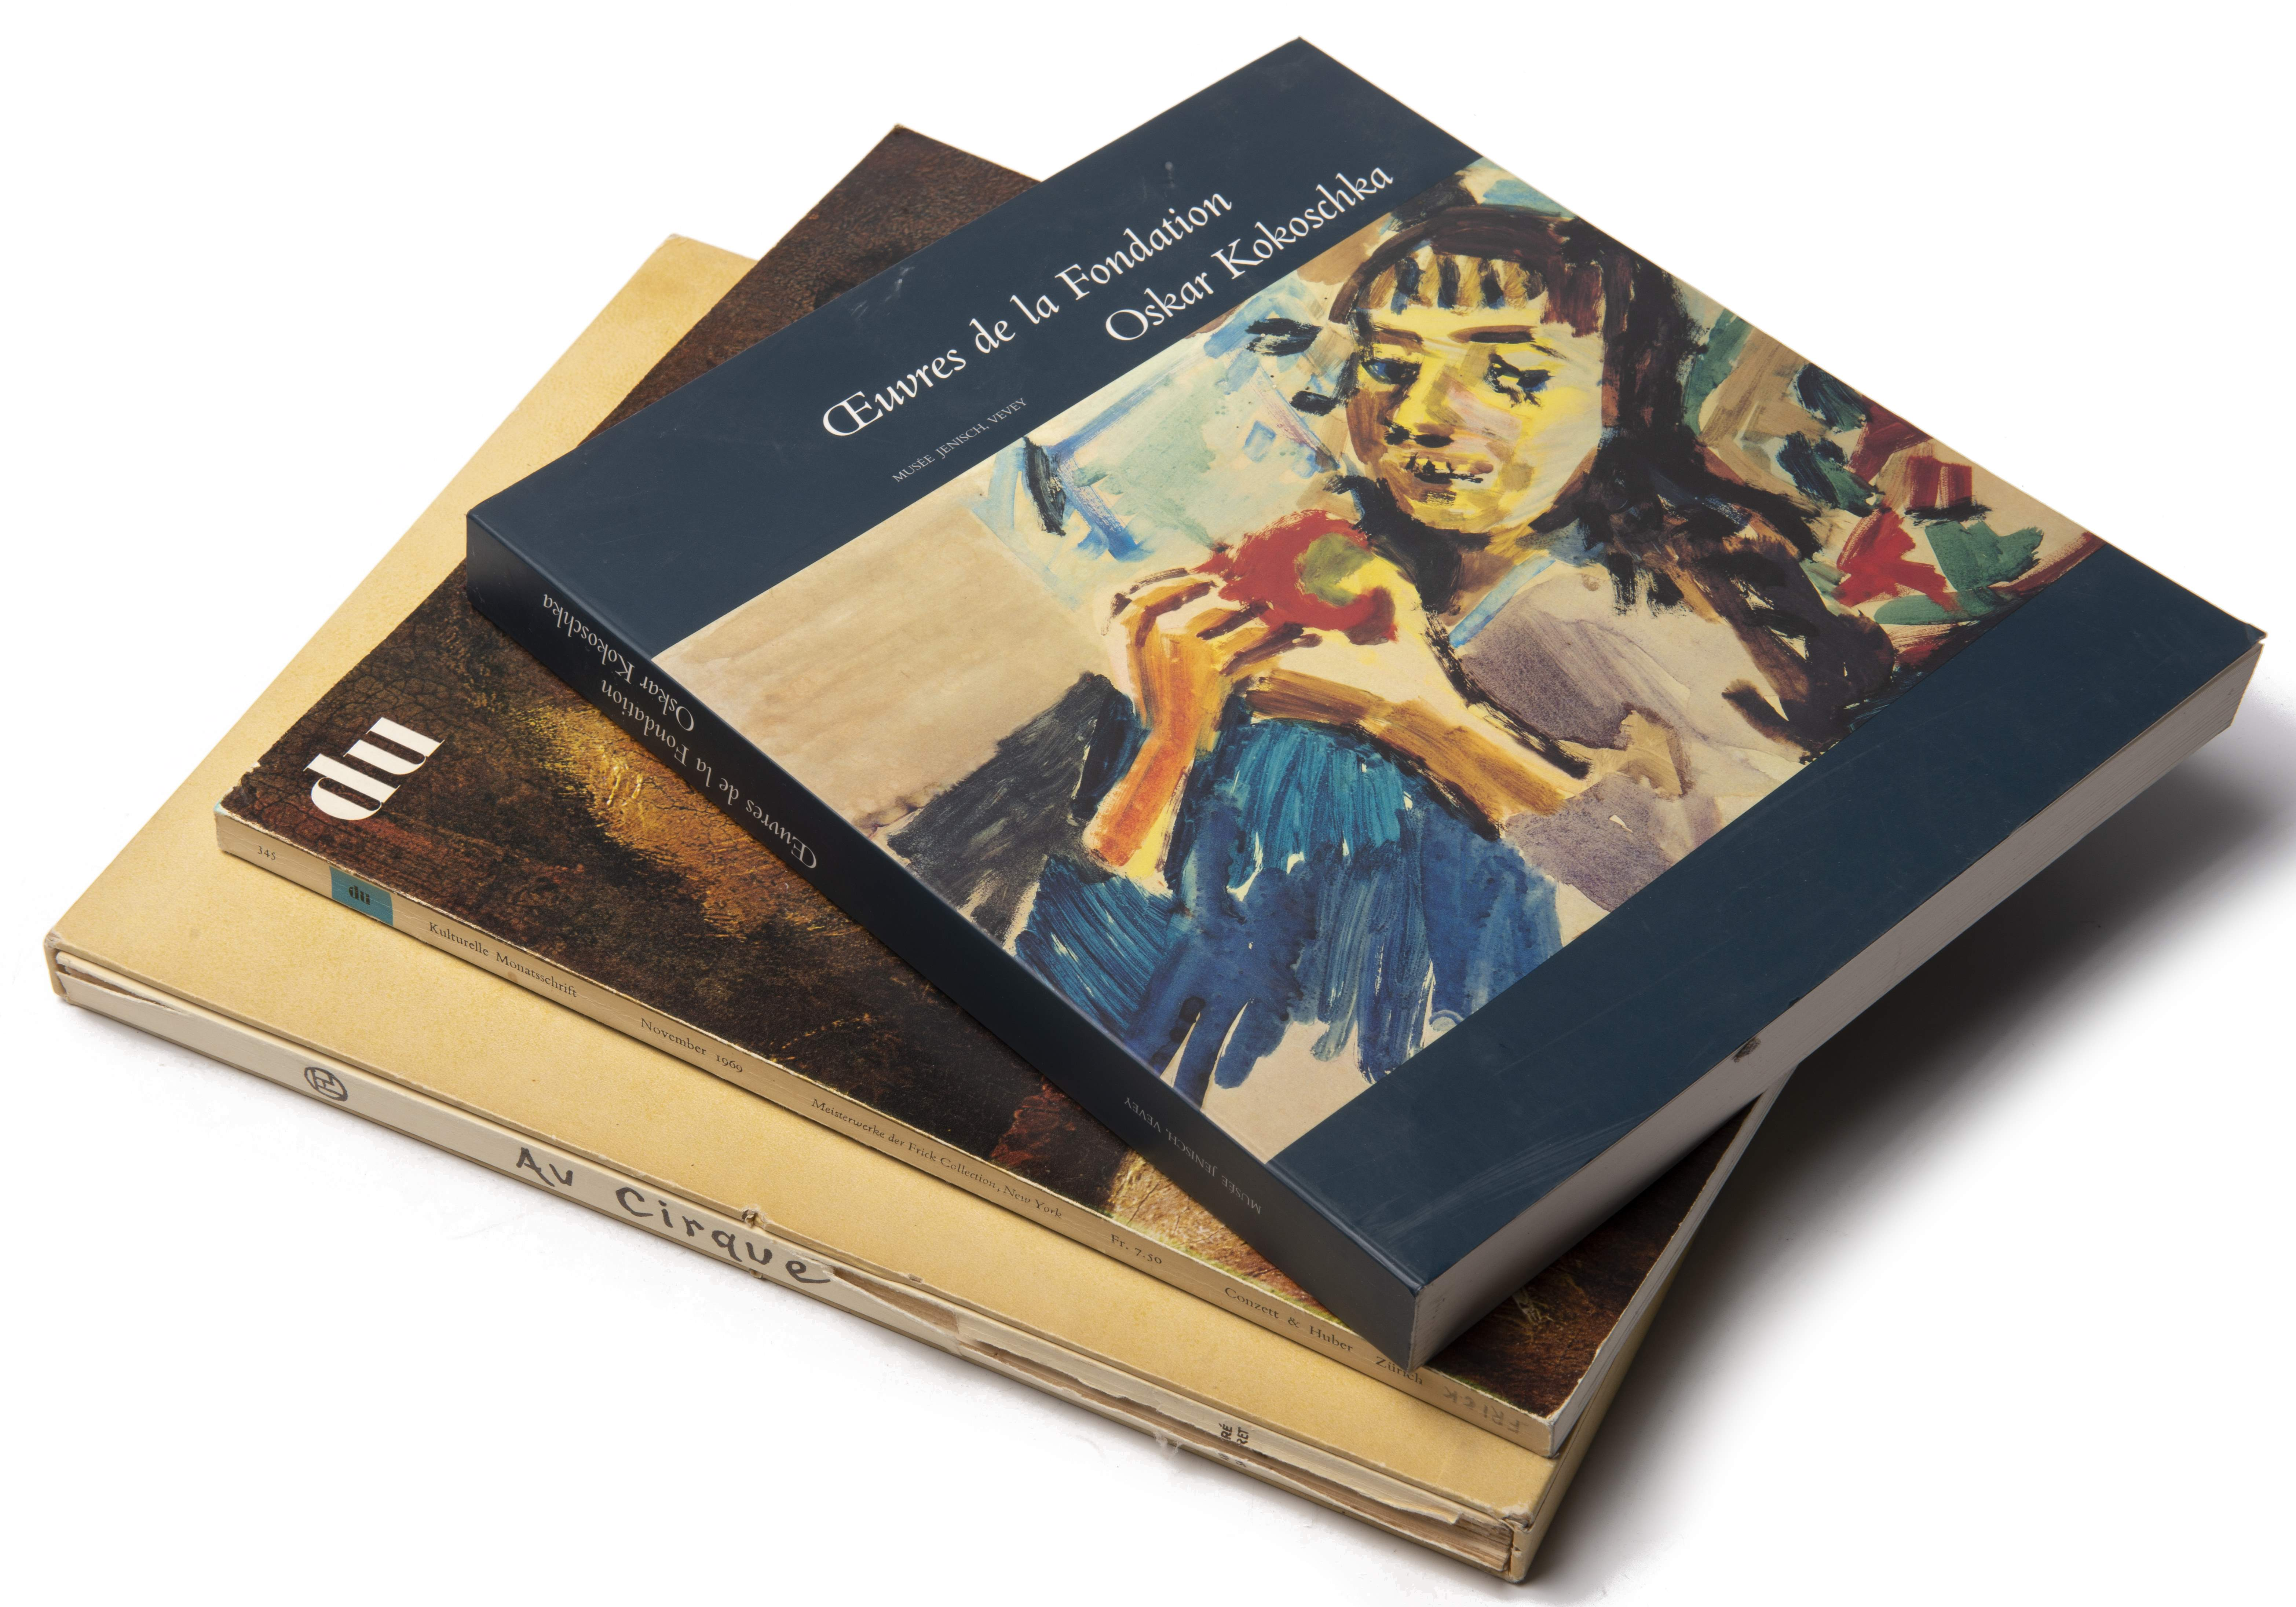 Toulouse Lautrec & Oskar Kokoschka & Frick Collection.